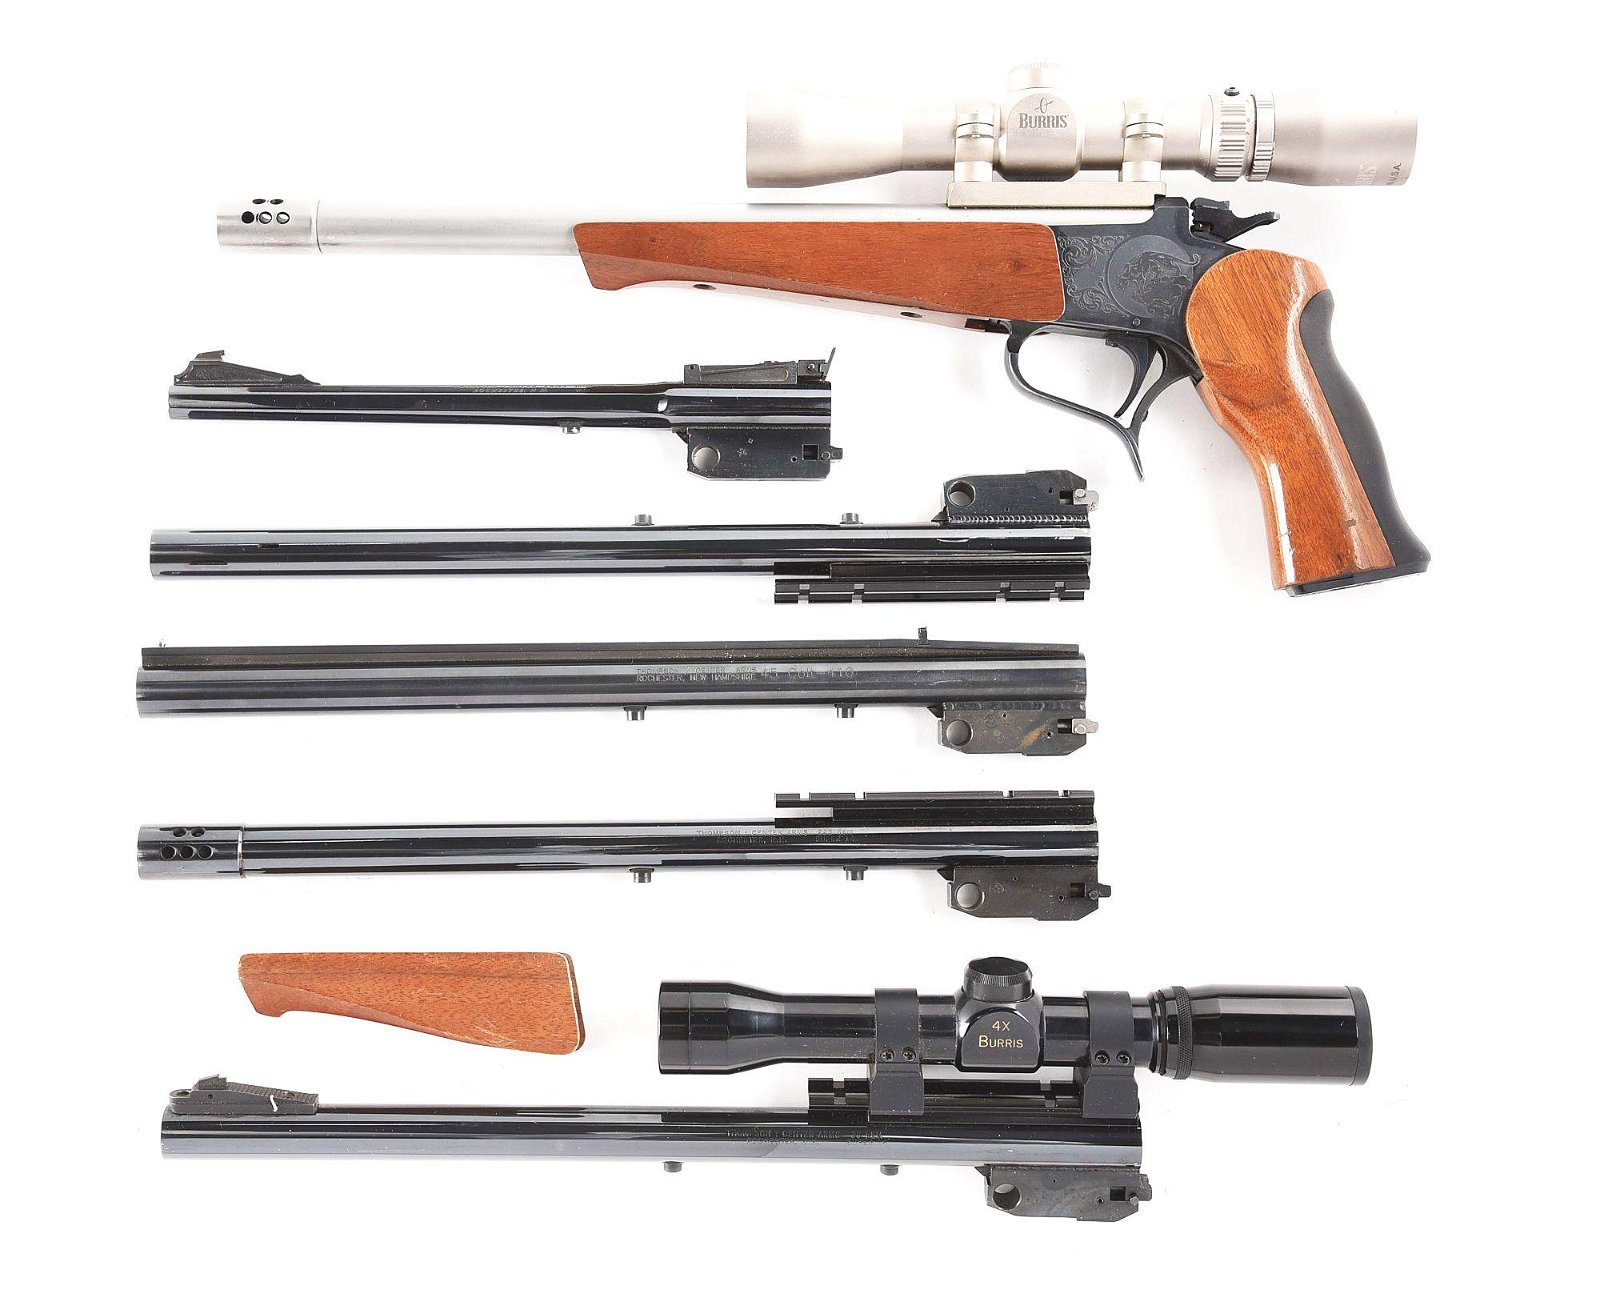 (M) THOMPSON CENTER ARMS CONTENDER 7-30 SINGLE SHOT